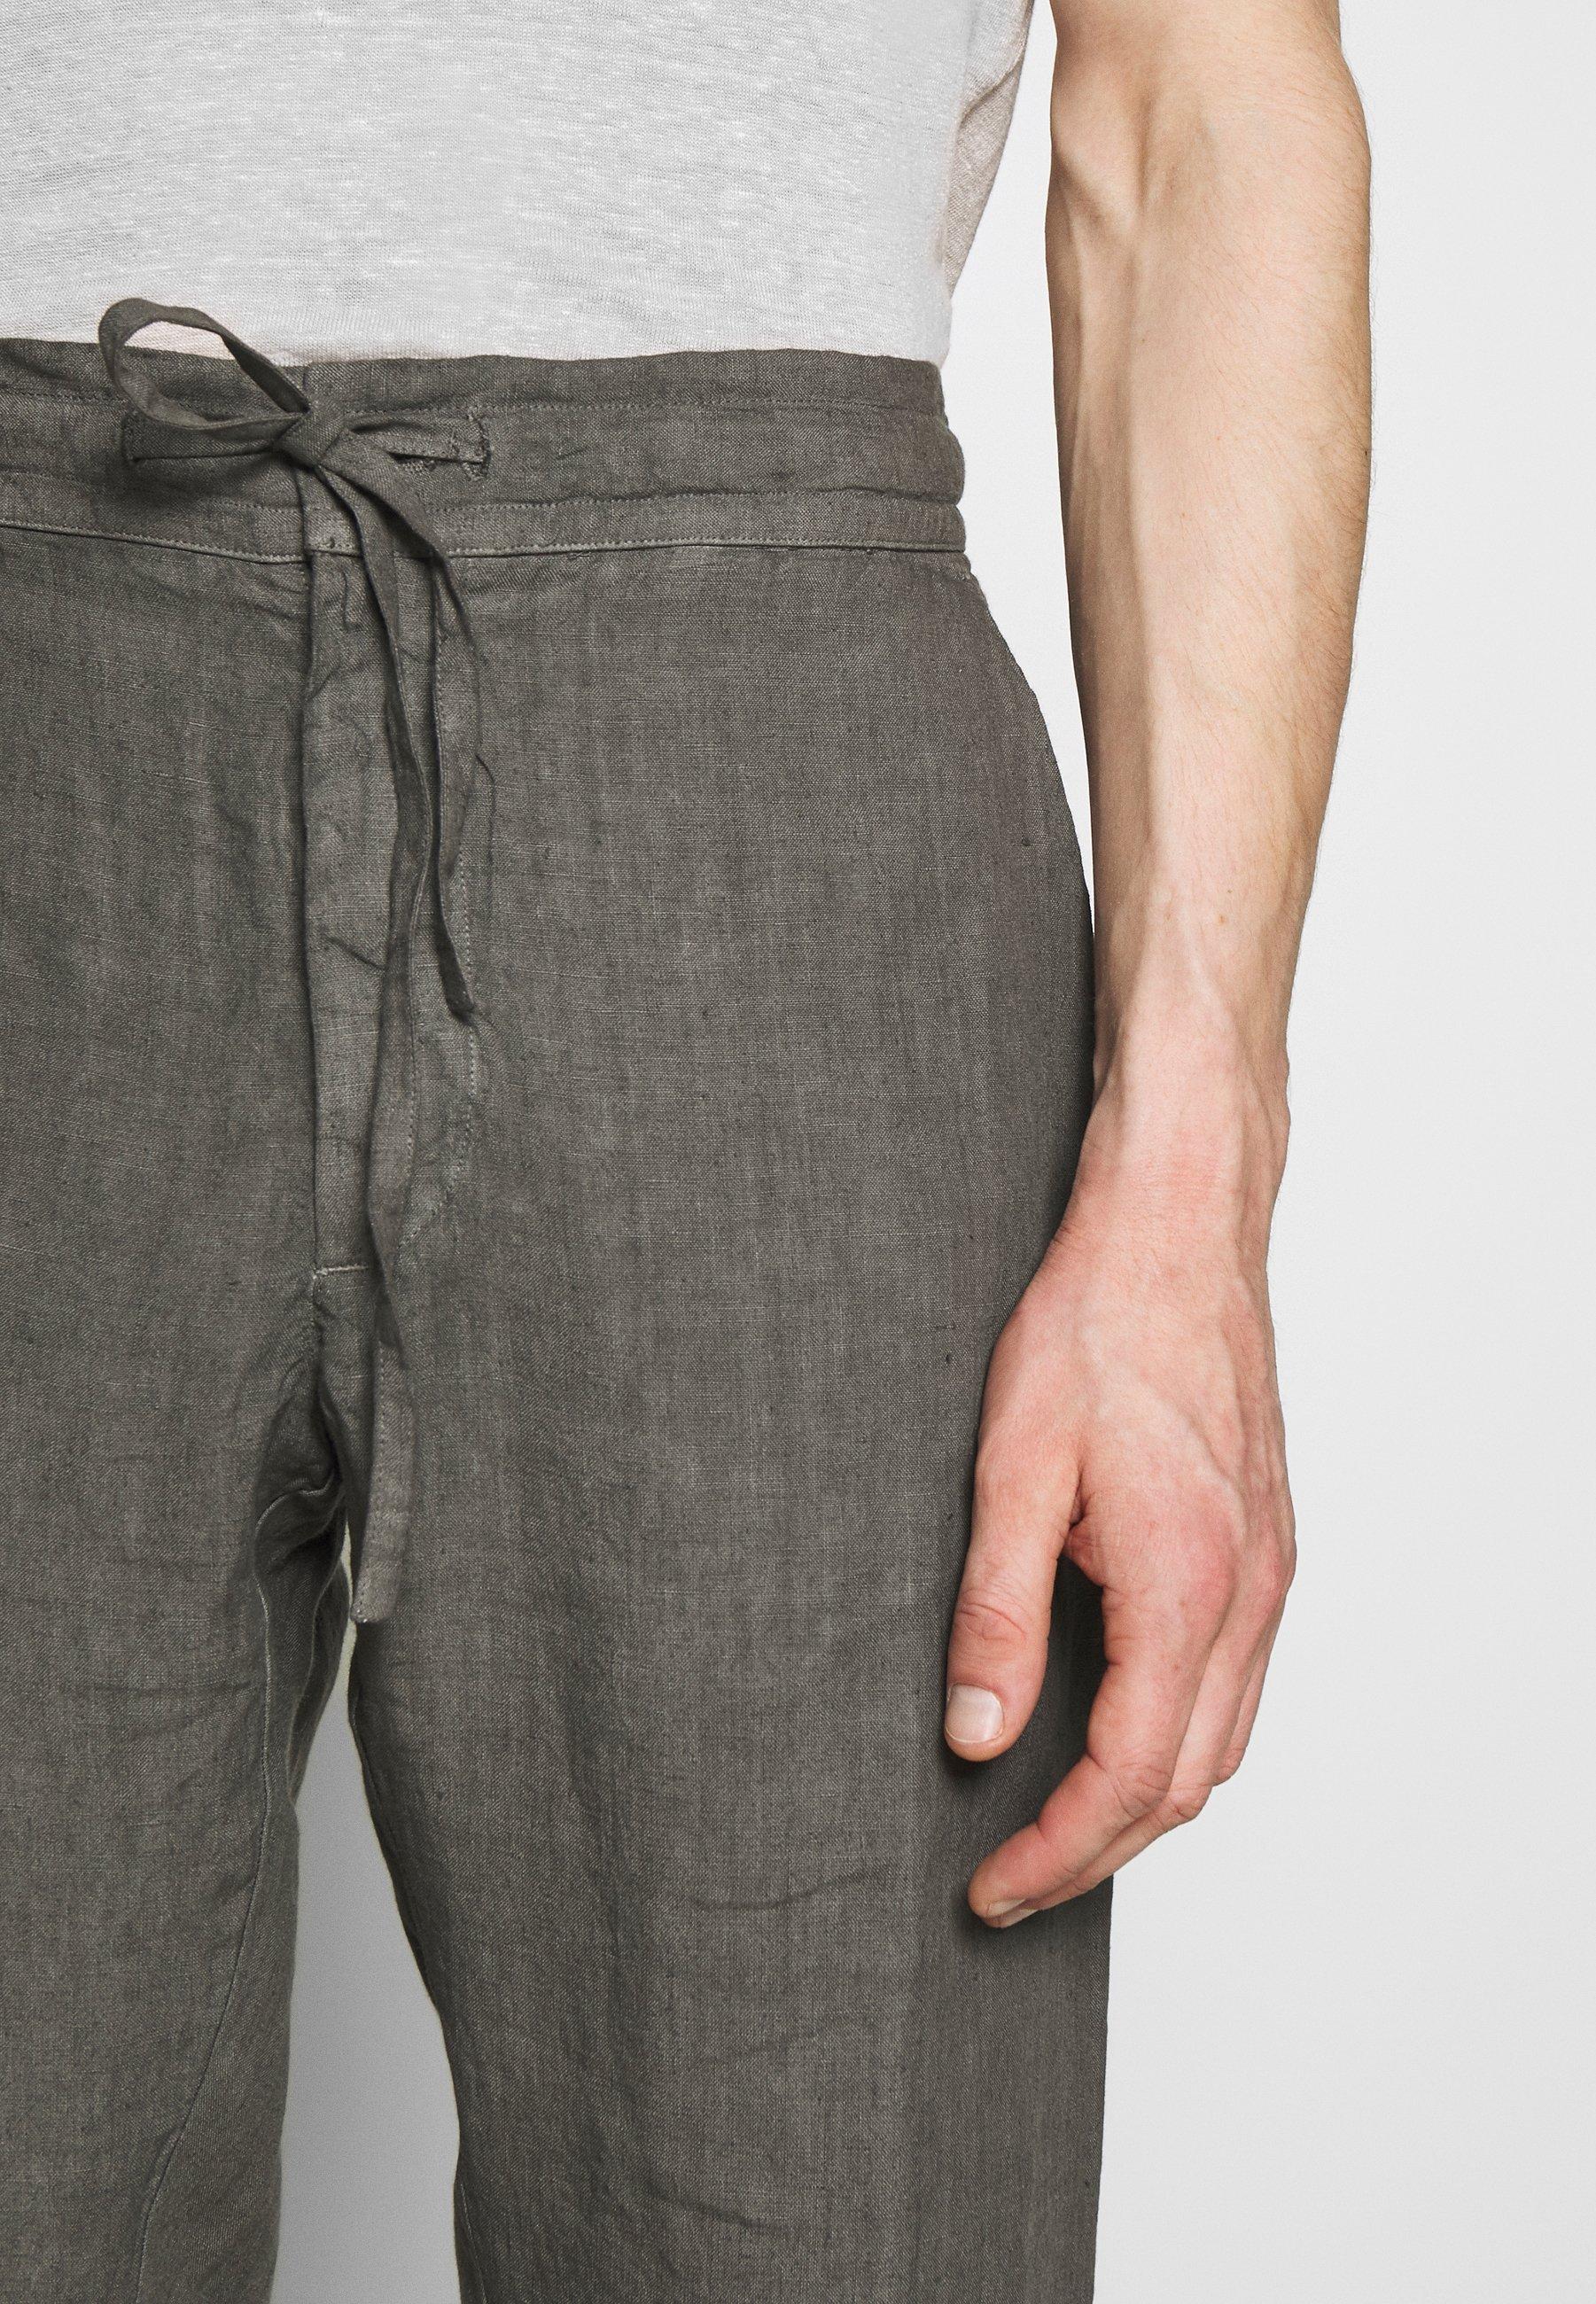 120% Lino Trousers - Tygbyxor Elephant Sof Fade